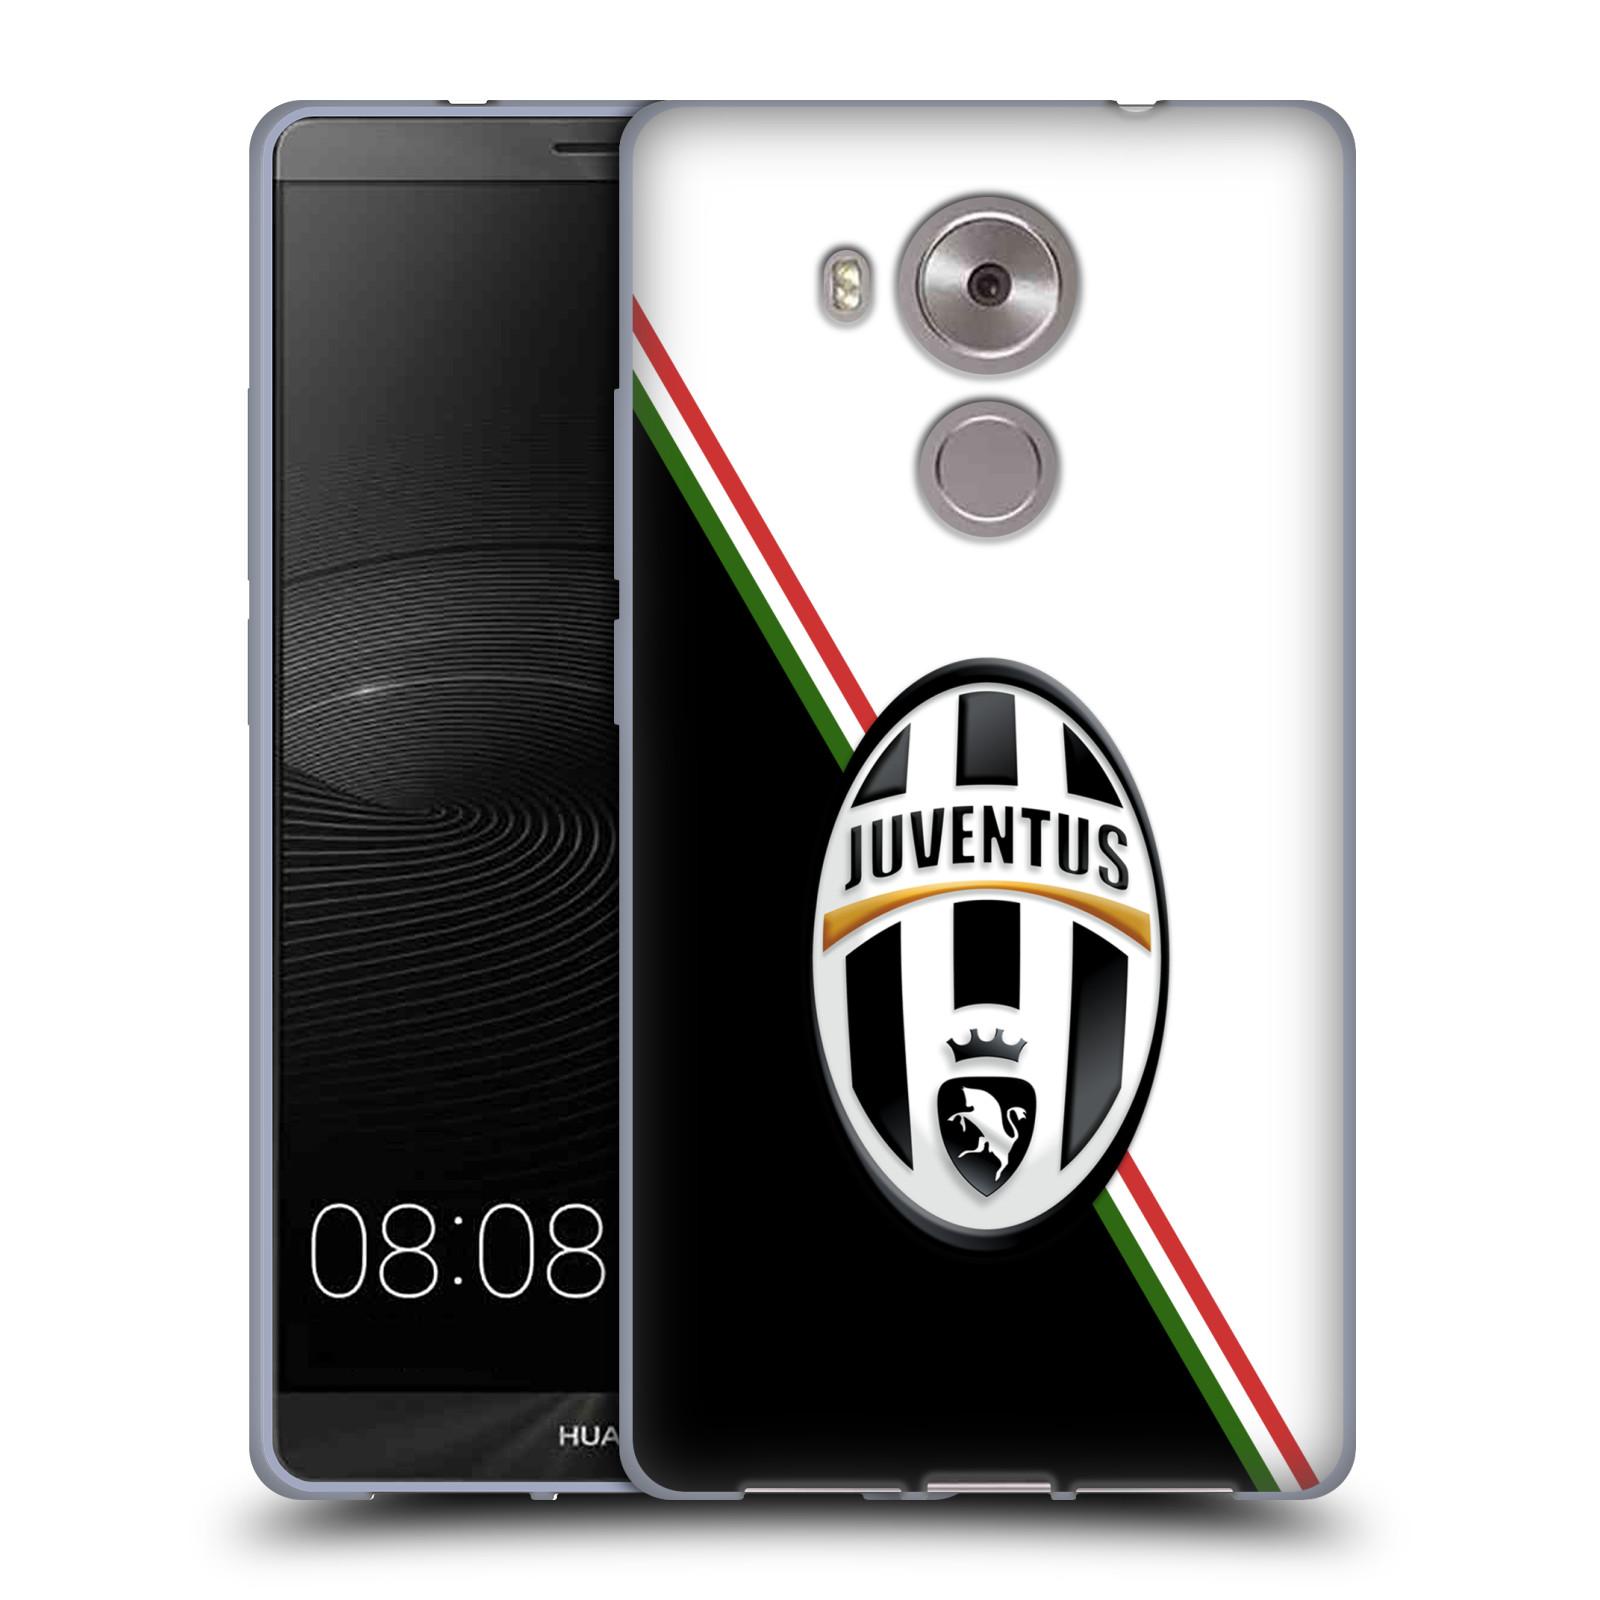 Silikonové pouzdro na mobil Huawei Ascend Mate 8 HEAD CASE Juventus FC - Black and White (Silikonový kryt či obal na mobilní telefon Juventus FC Official pro Huawei Ascend MATE8)